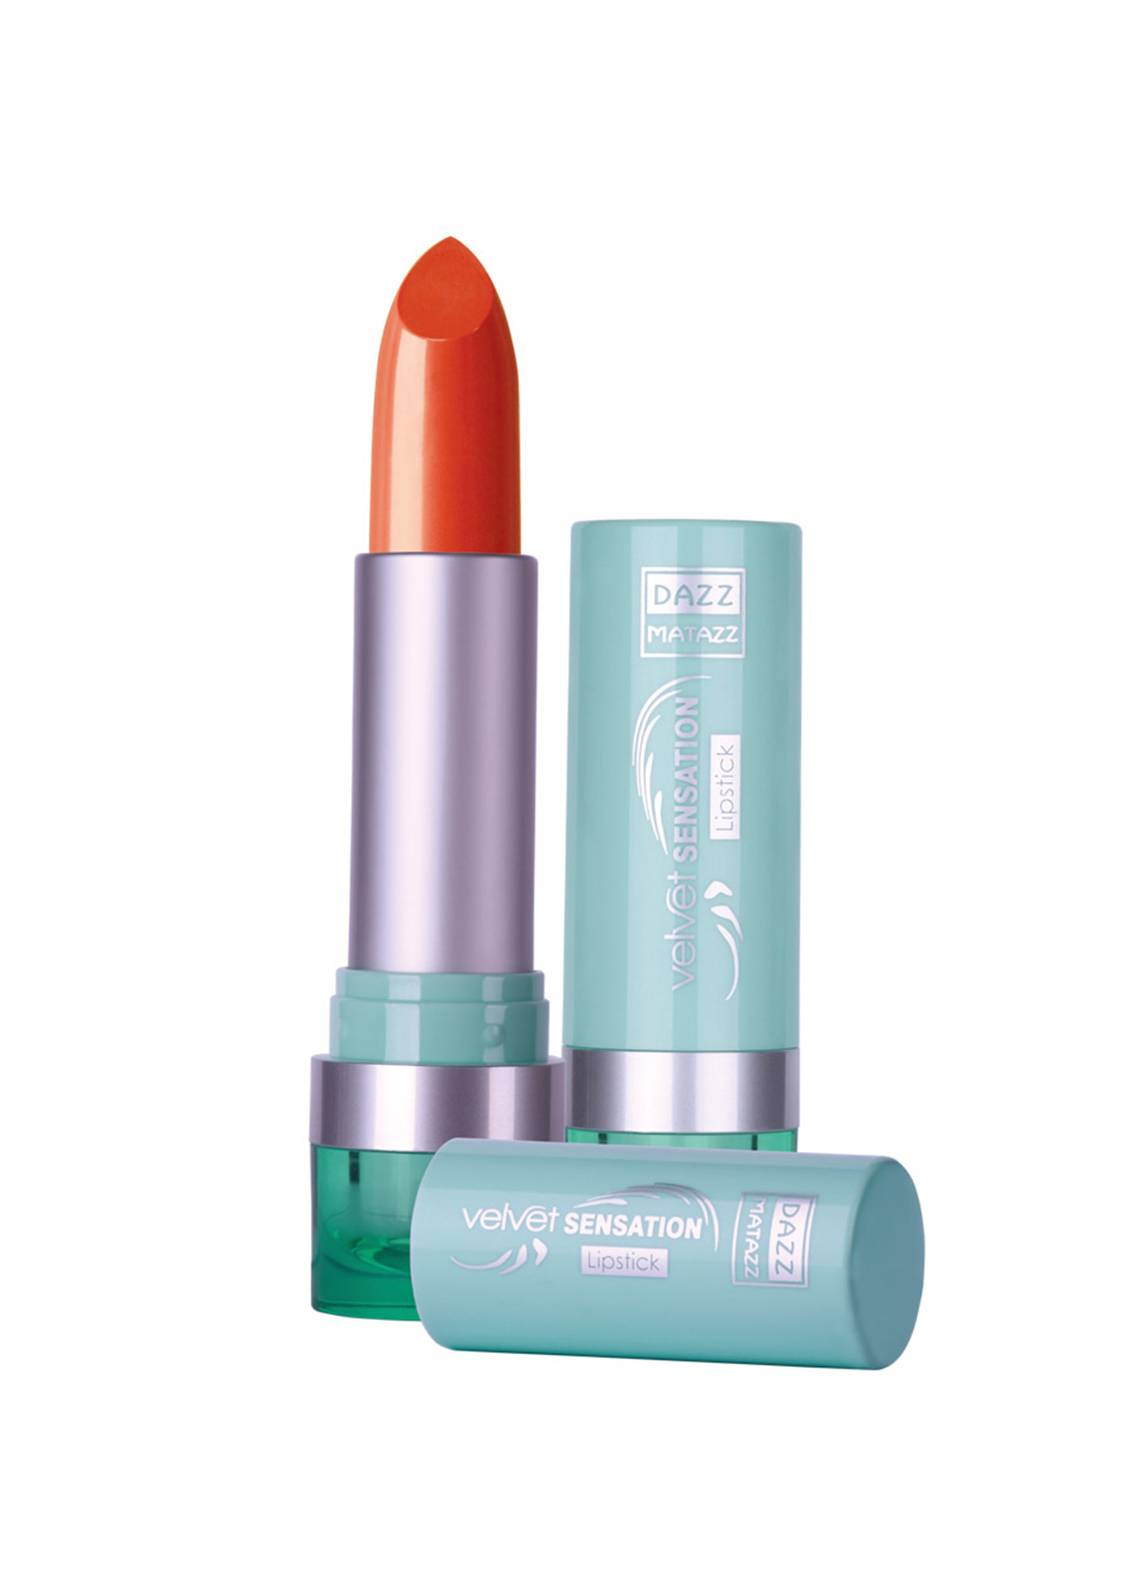 Dazz Matazz Velvet Sensation Lipstick-22 ORANGE JELLO